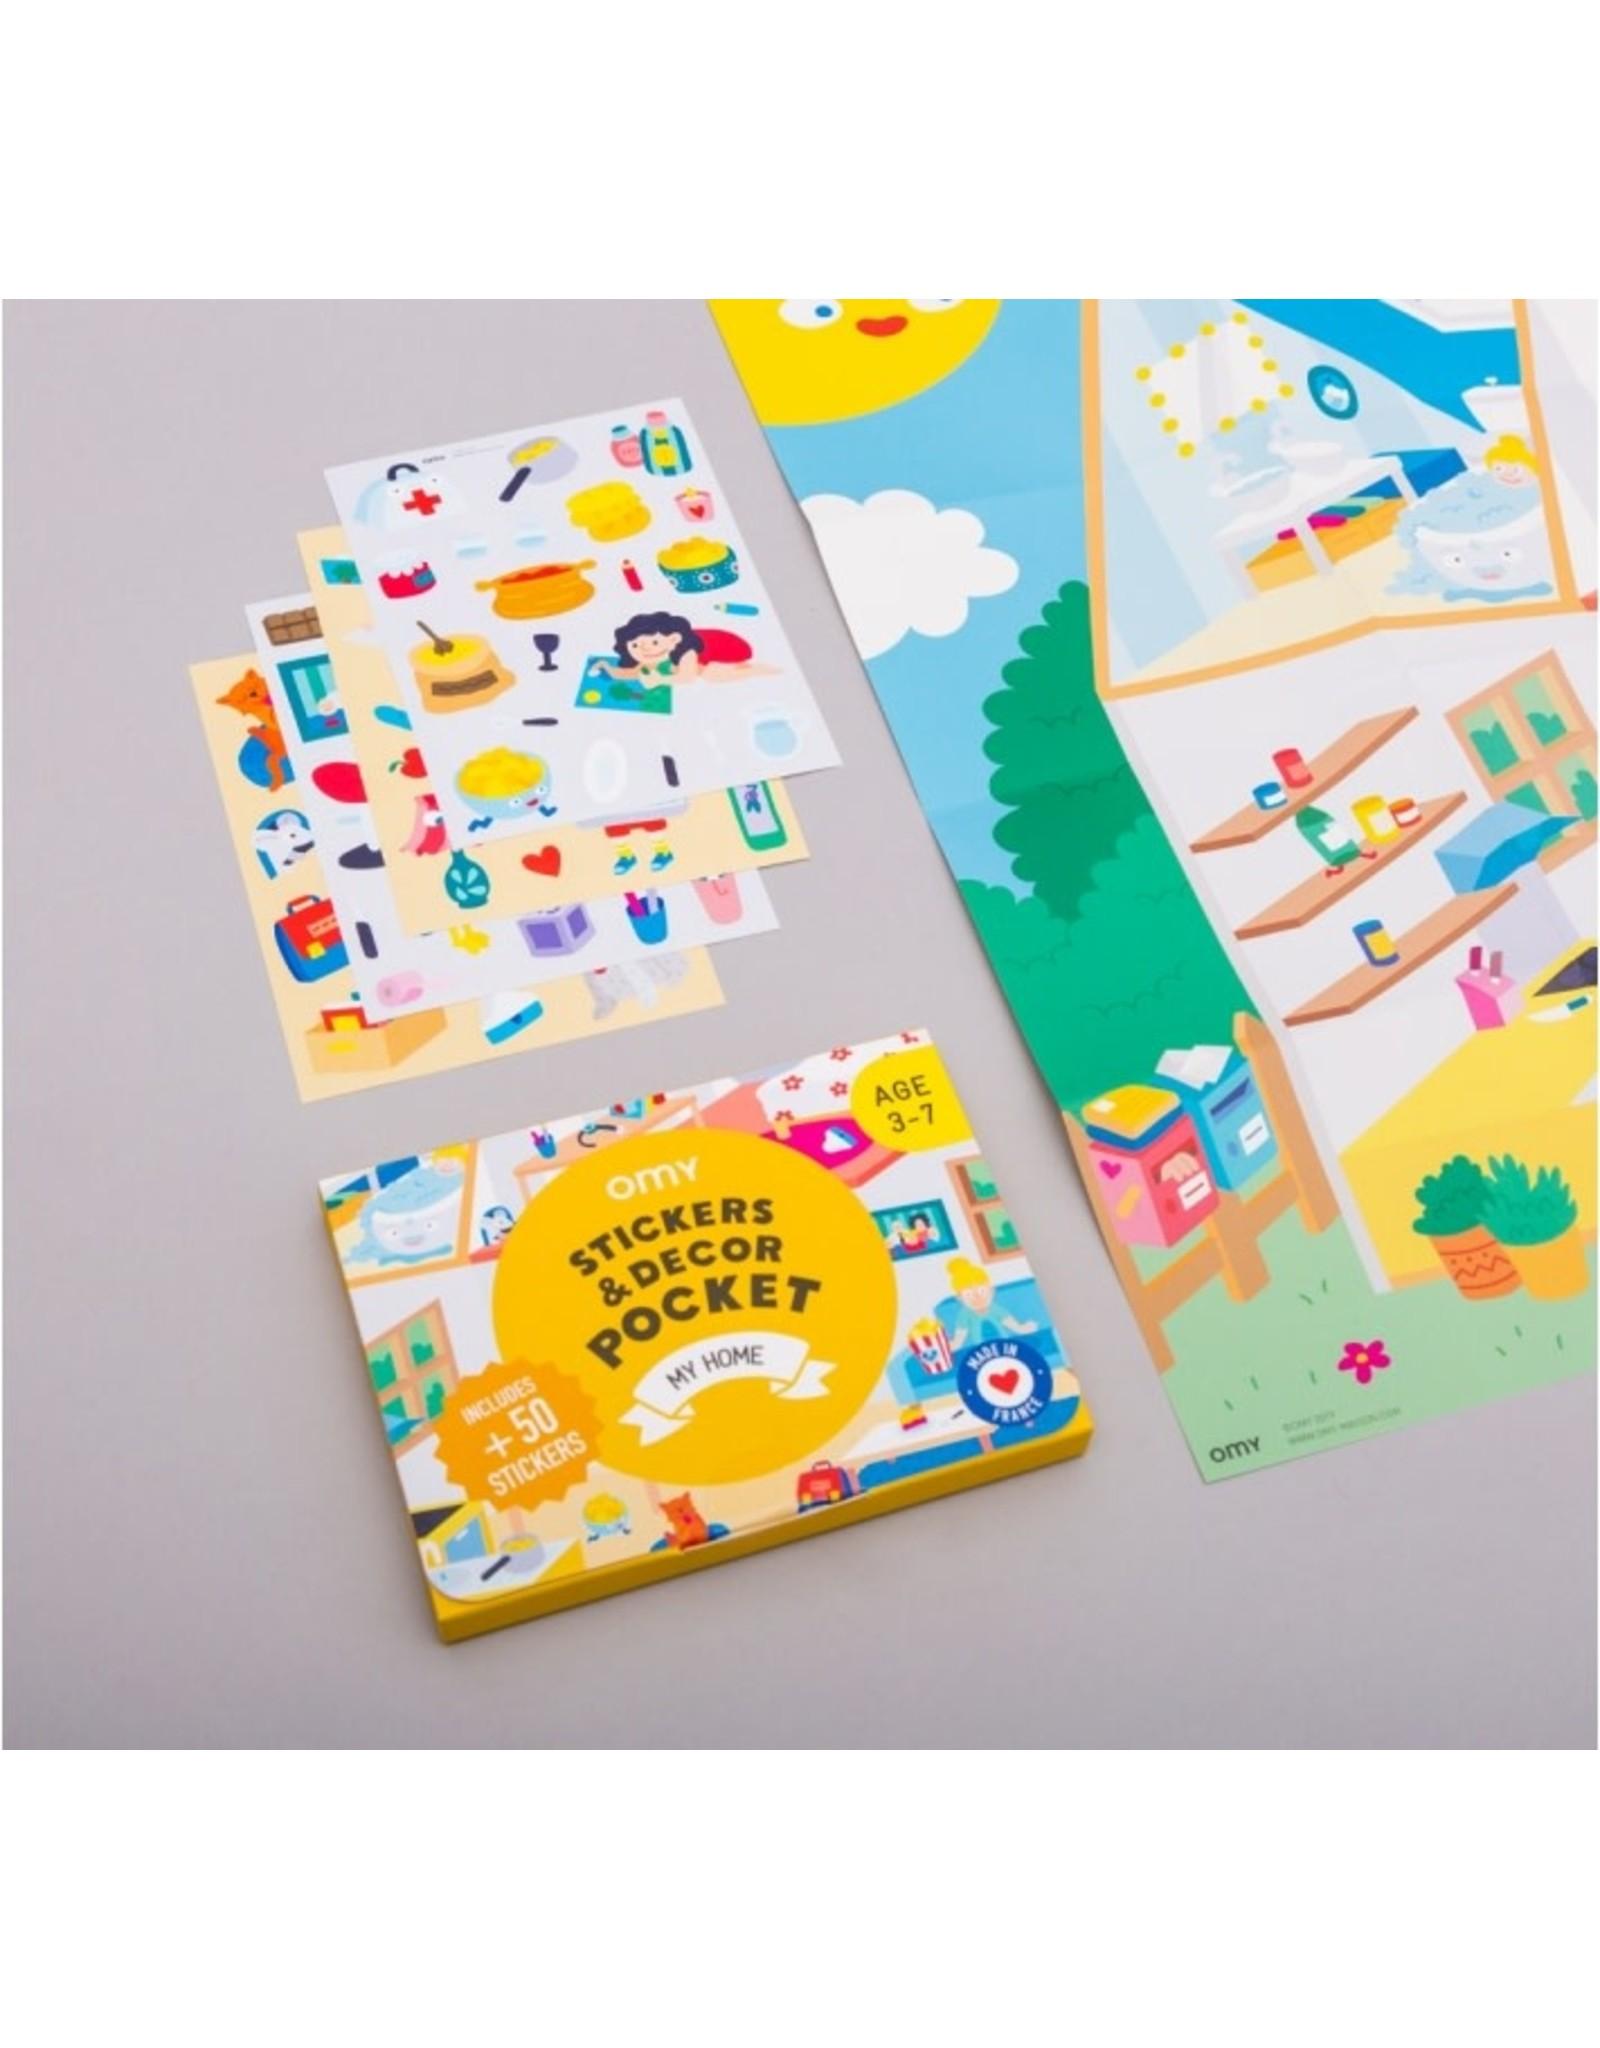 OMY Stickers decor pocket - My home